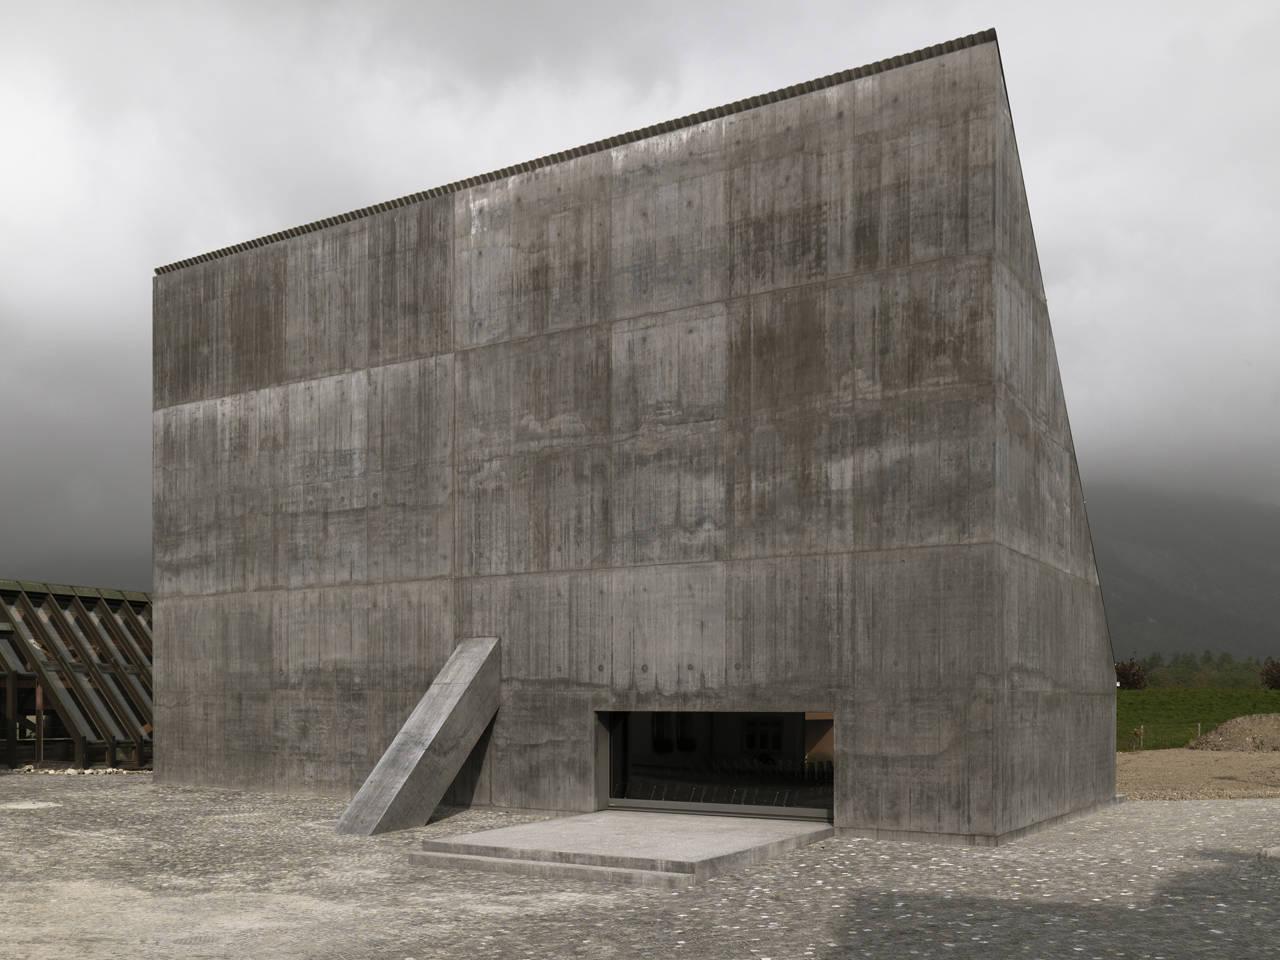 Concrete Building With Windows : Plantahof auditorium archdaily